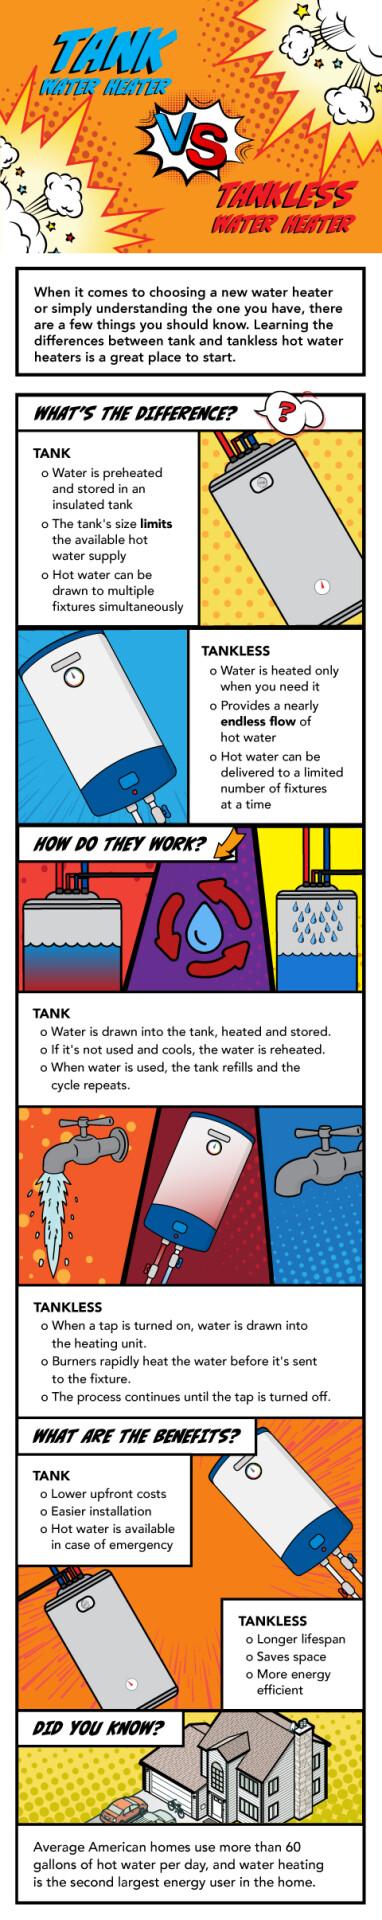 Tank Water Heater Versus Tankless Water Heater Infographic